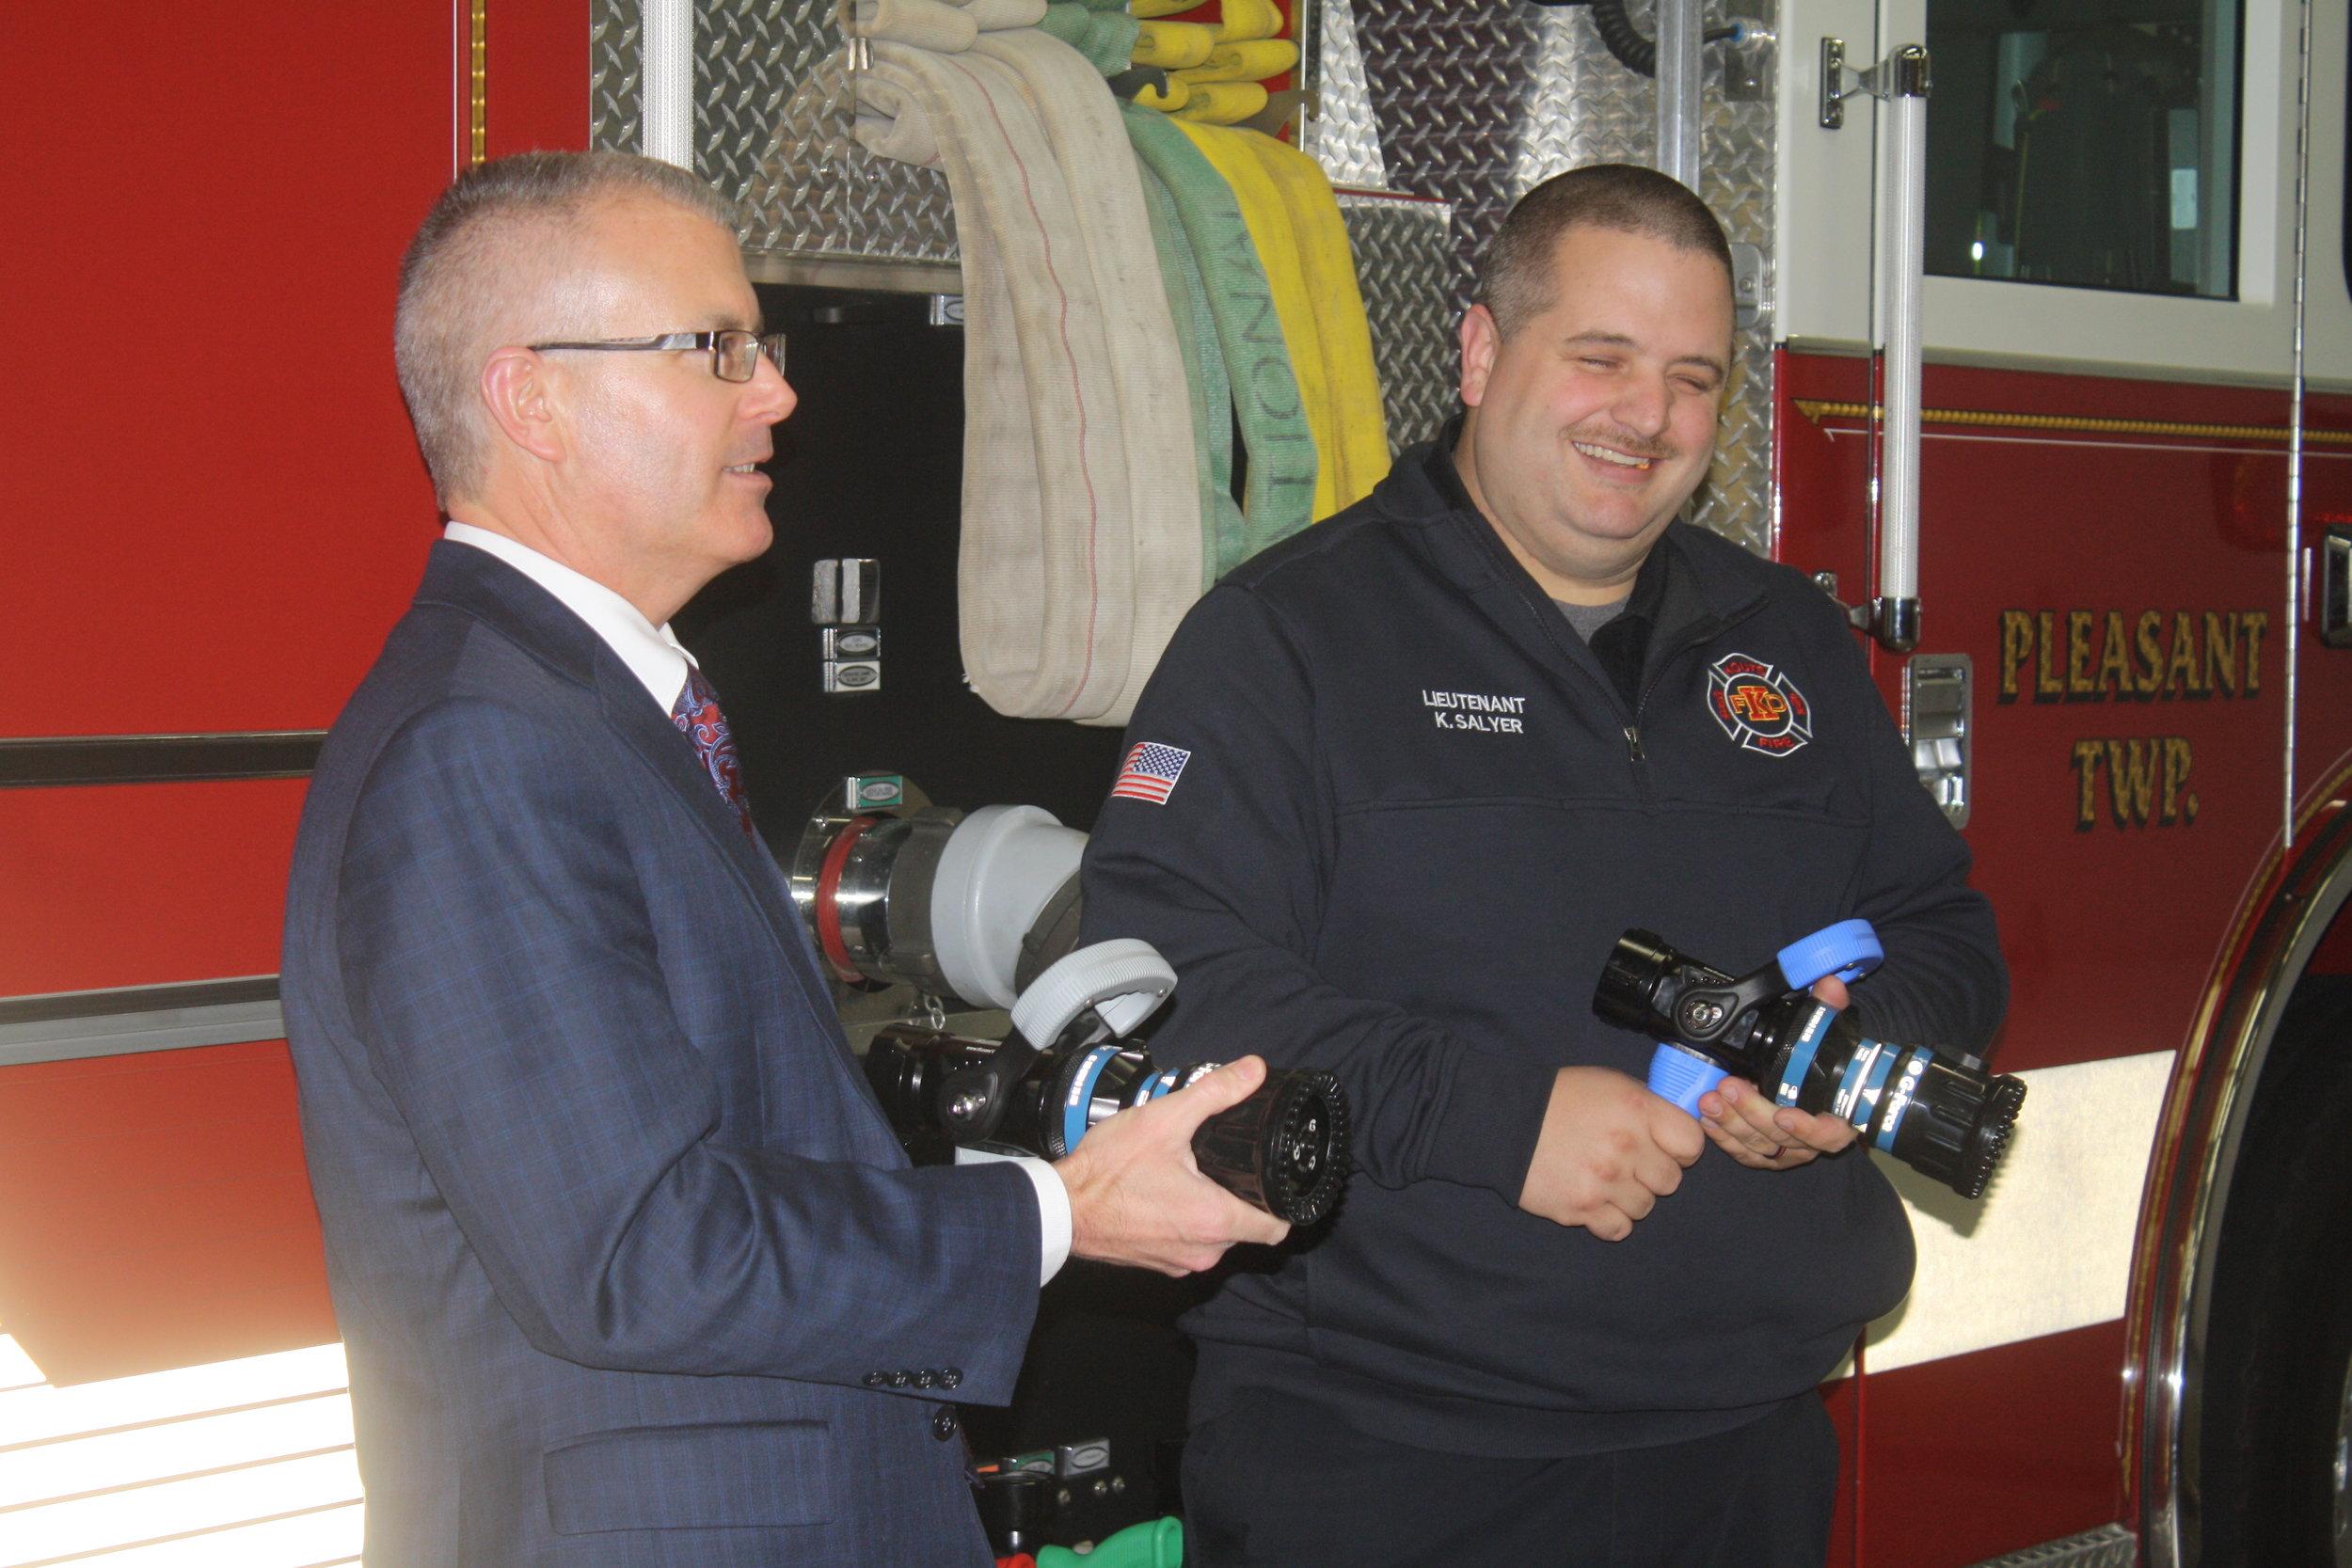 Kouts Fire Department Grant